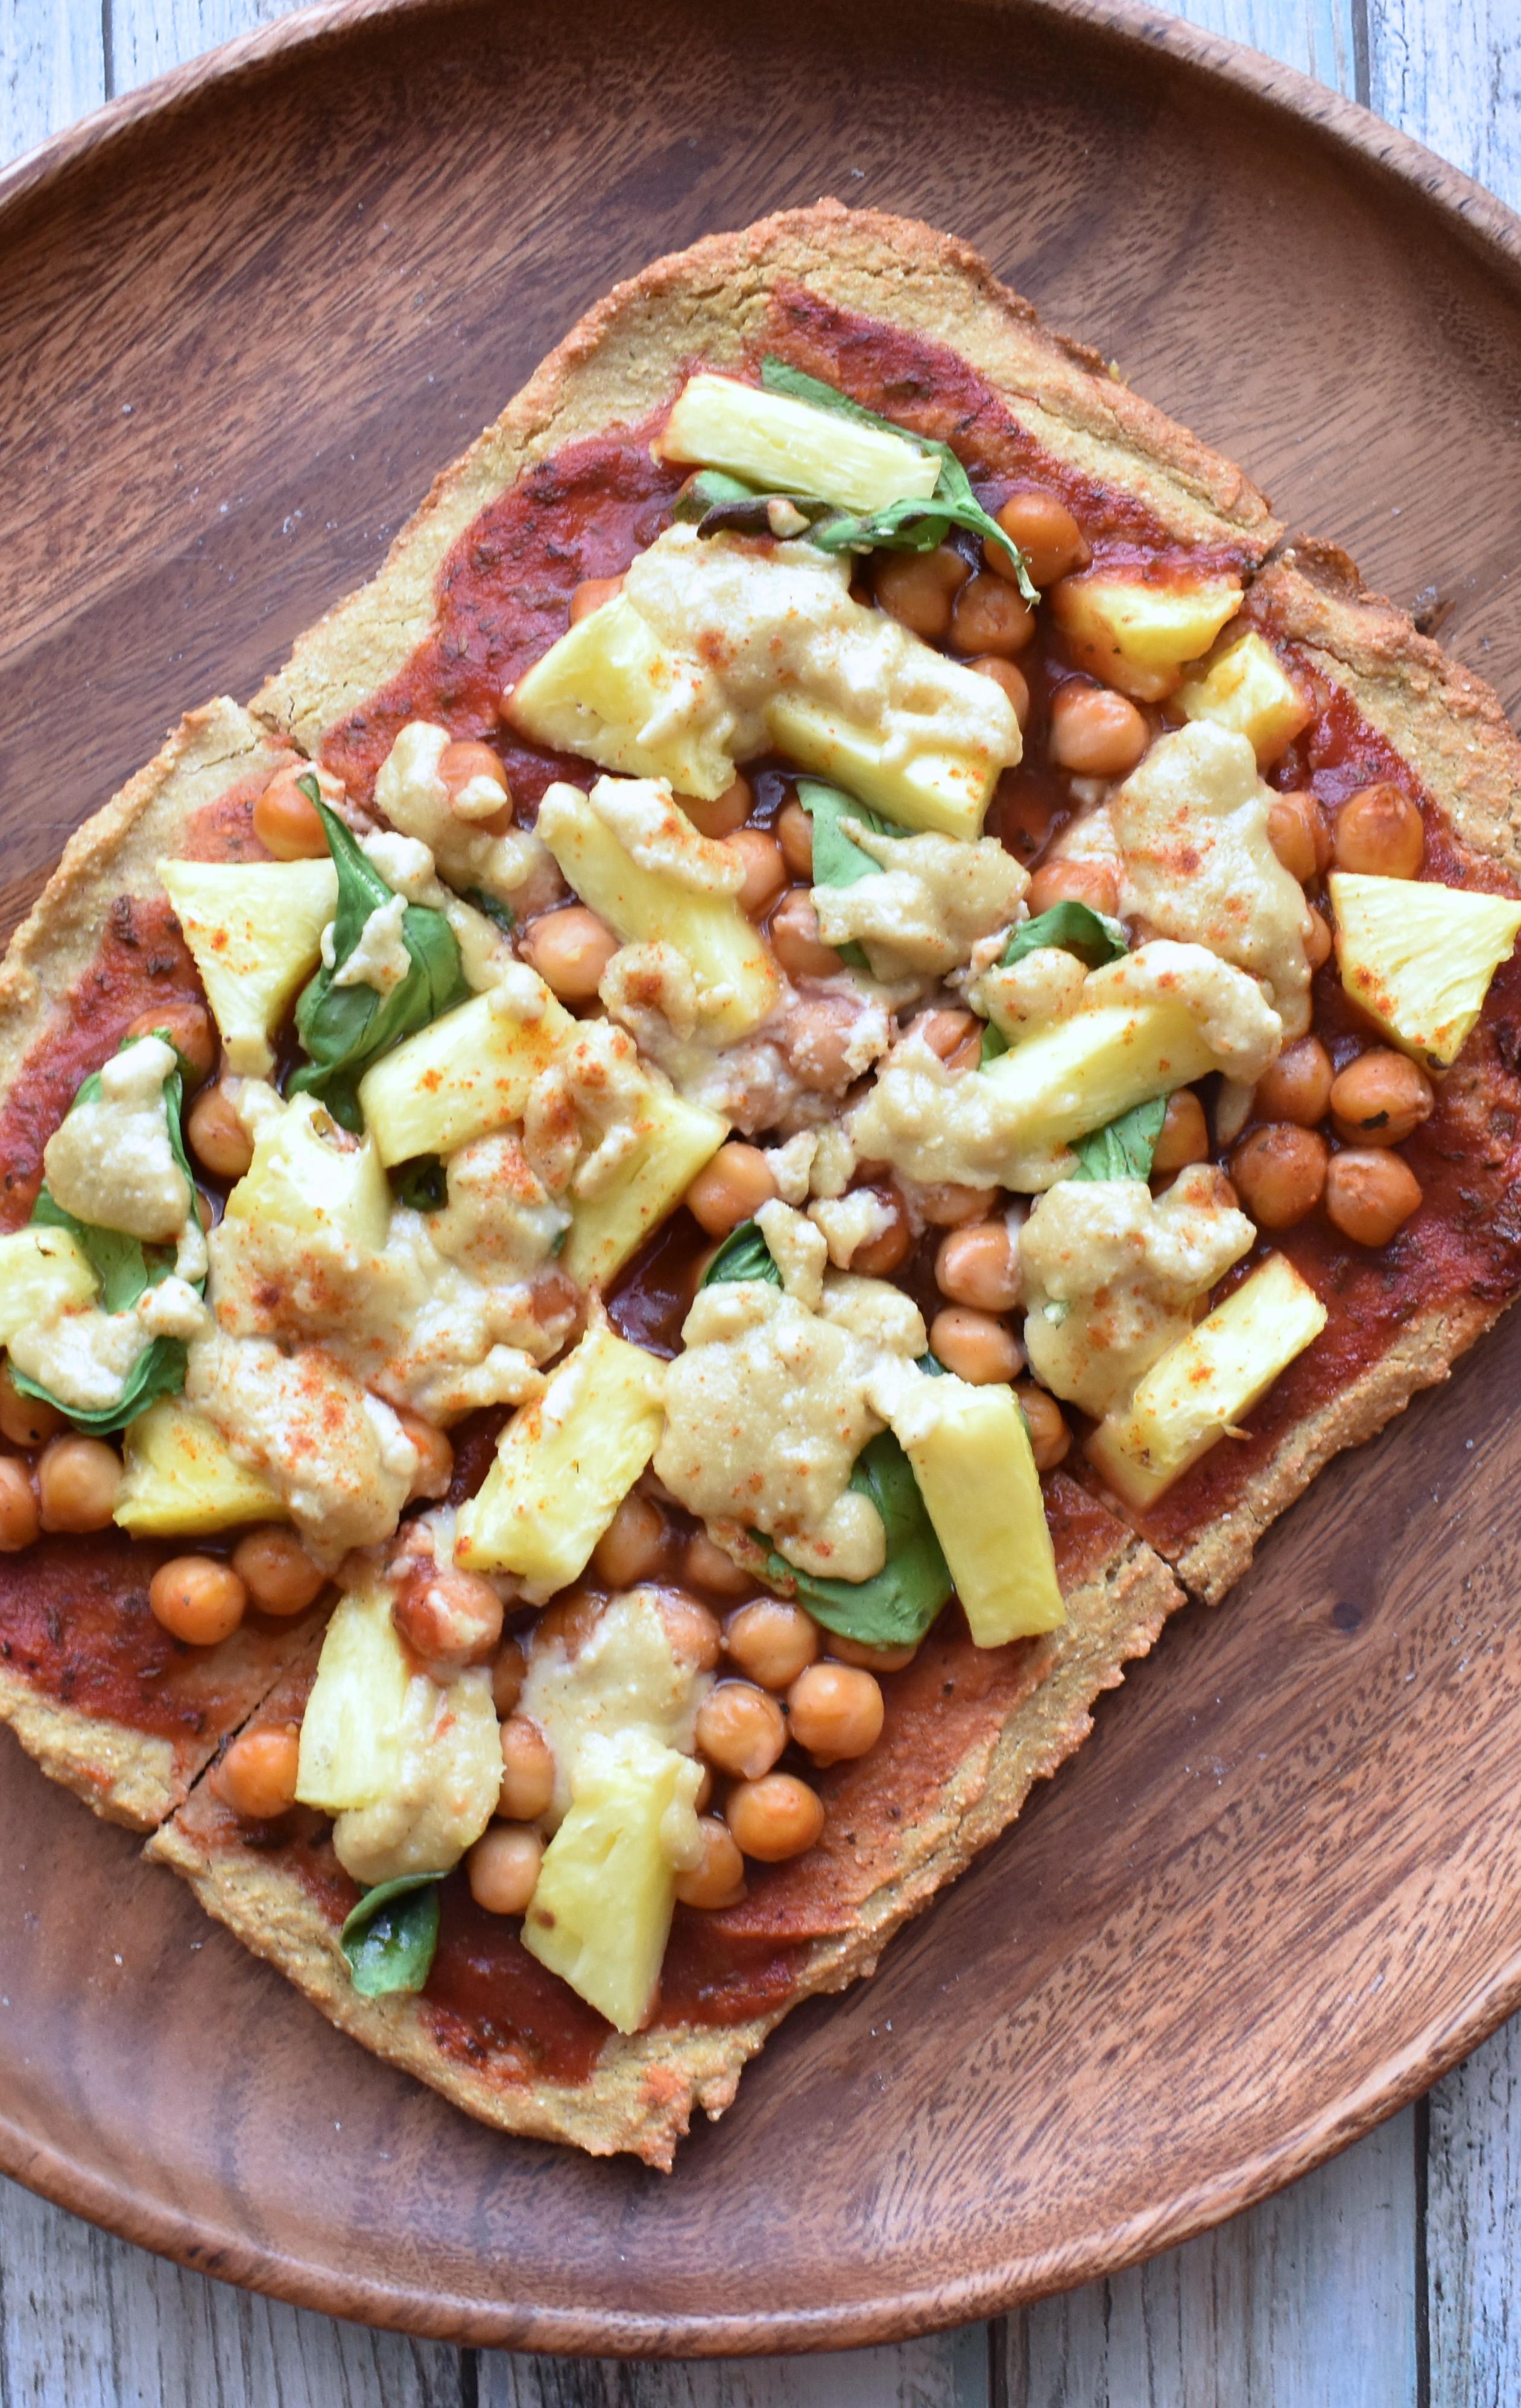 Easy Healthy Gluten Free Recipes  Easy & Healthy Pizza Crust Recipe Gluten Free & Vegan